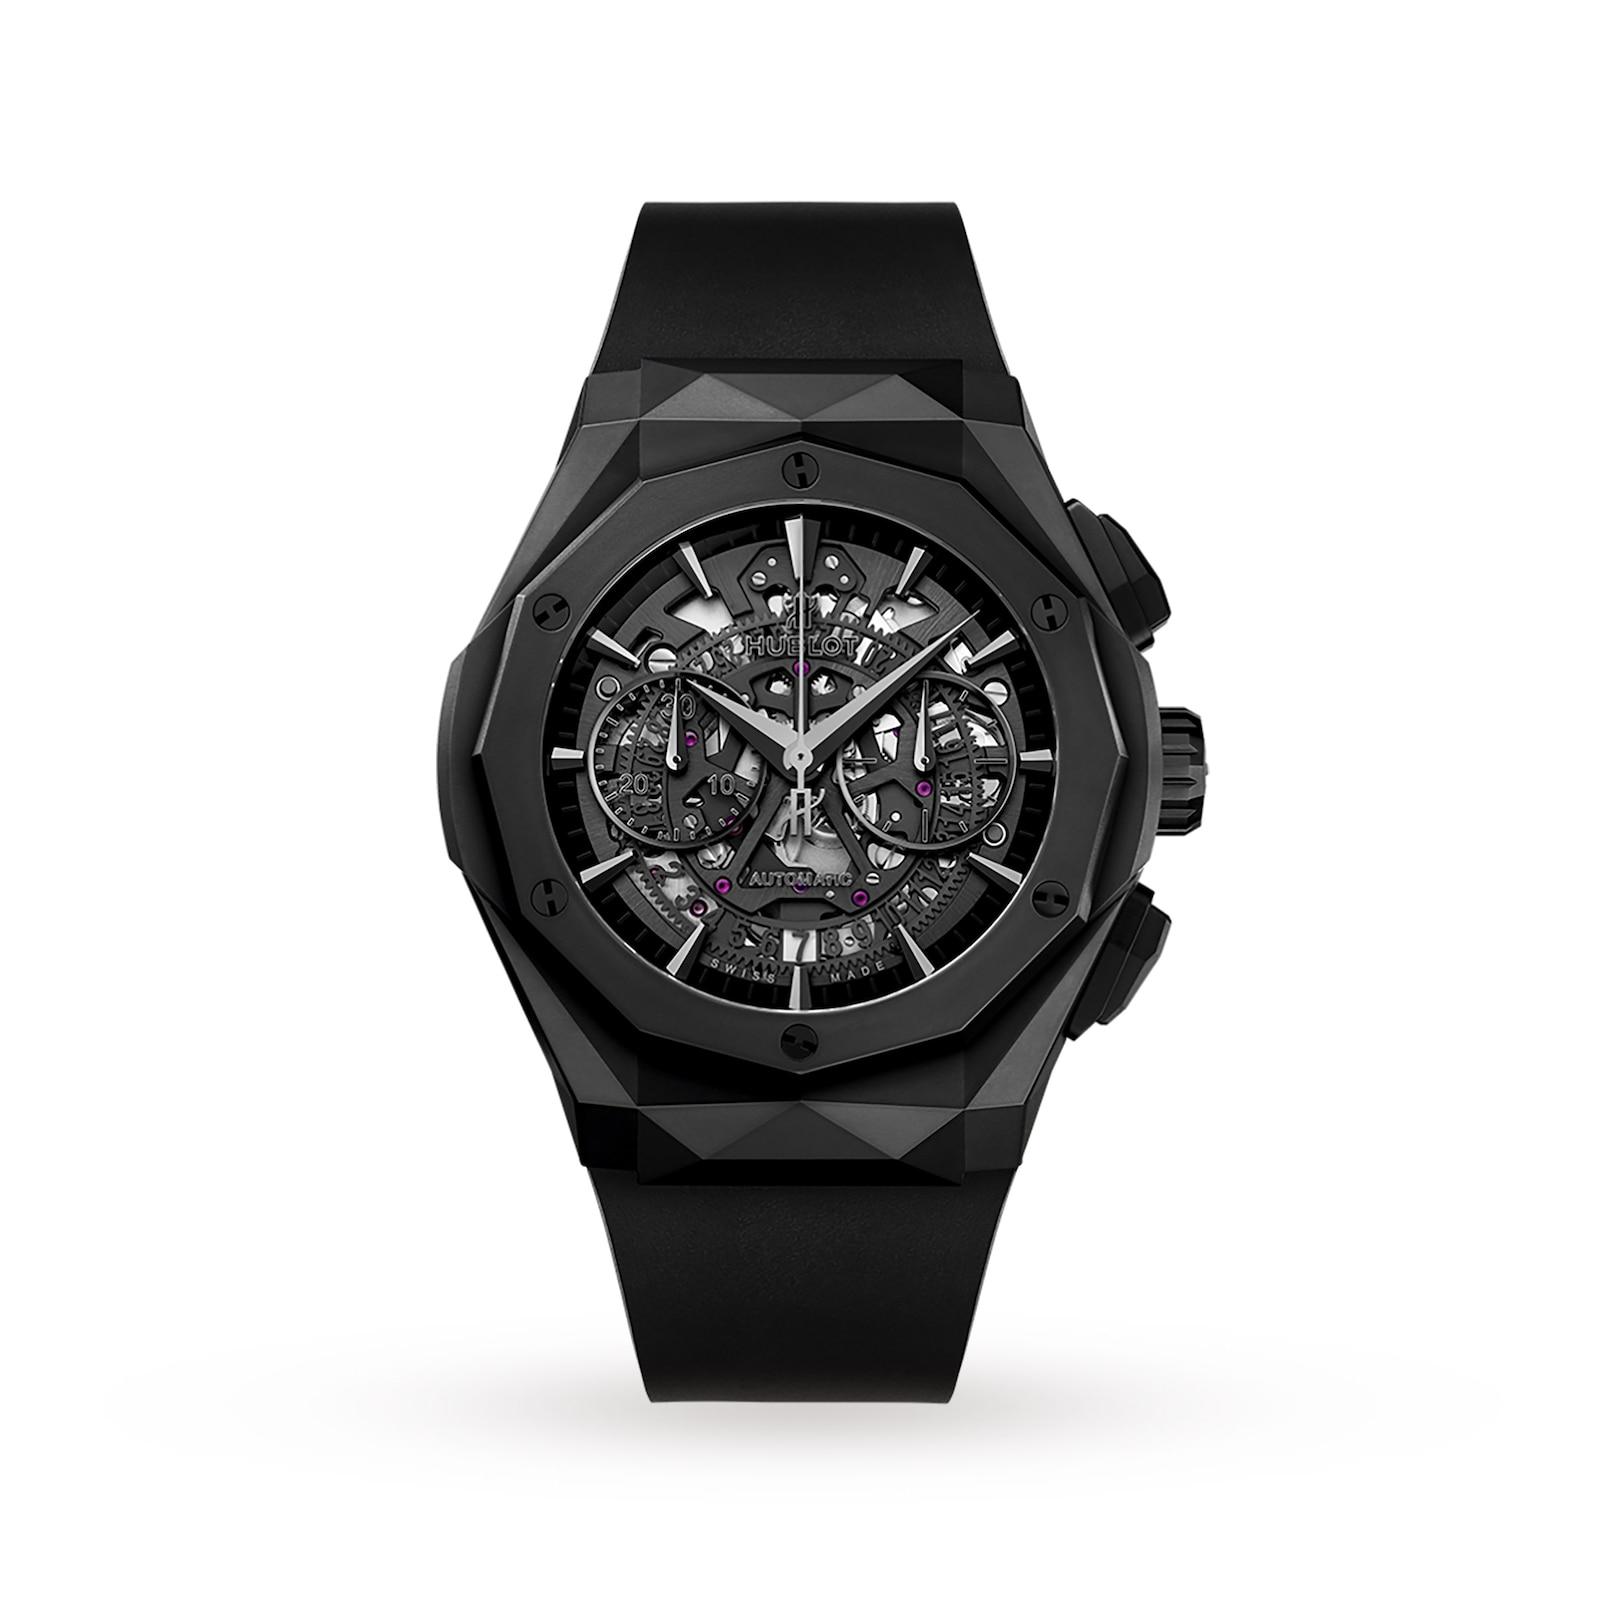 Hublot Hublot Classic Fusion Aerofusion Chronograph Orlinski All Black 45mm Mens Watch